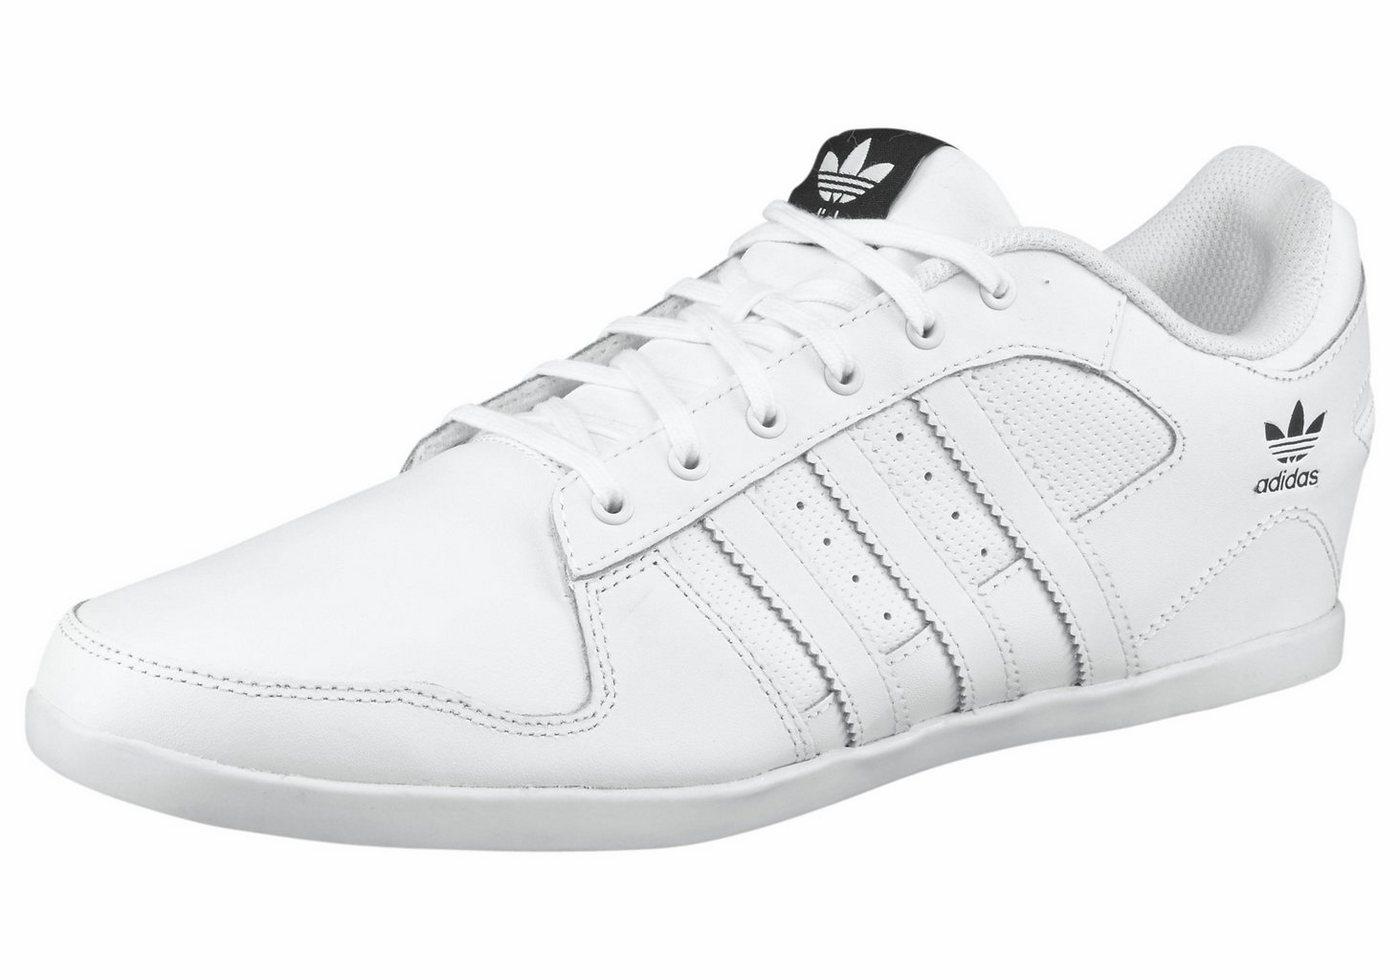 Adidas Originals Plimcana 2.0 Low Sneaker